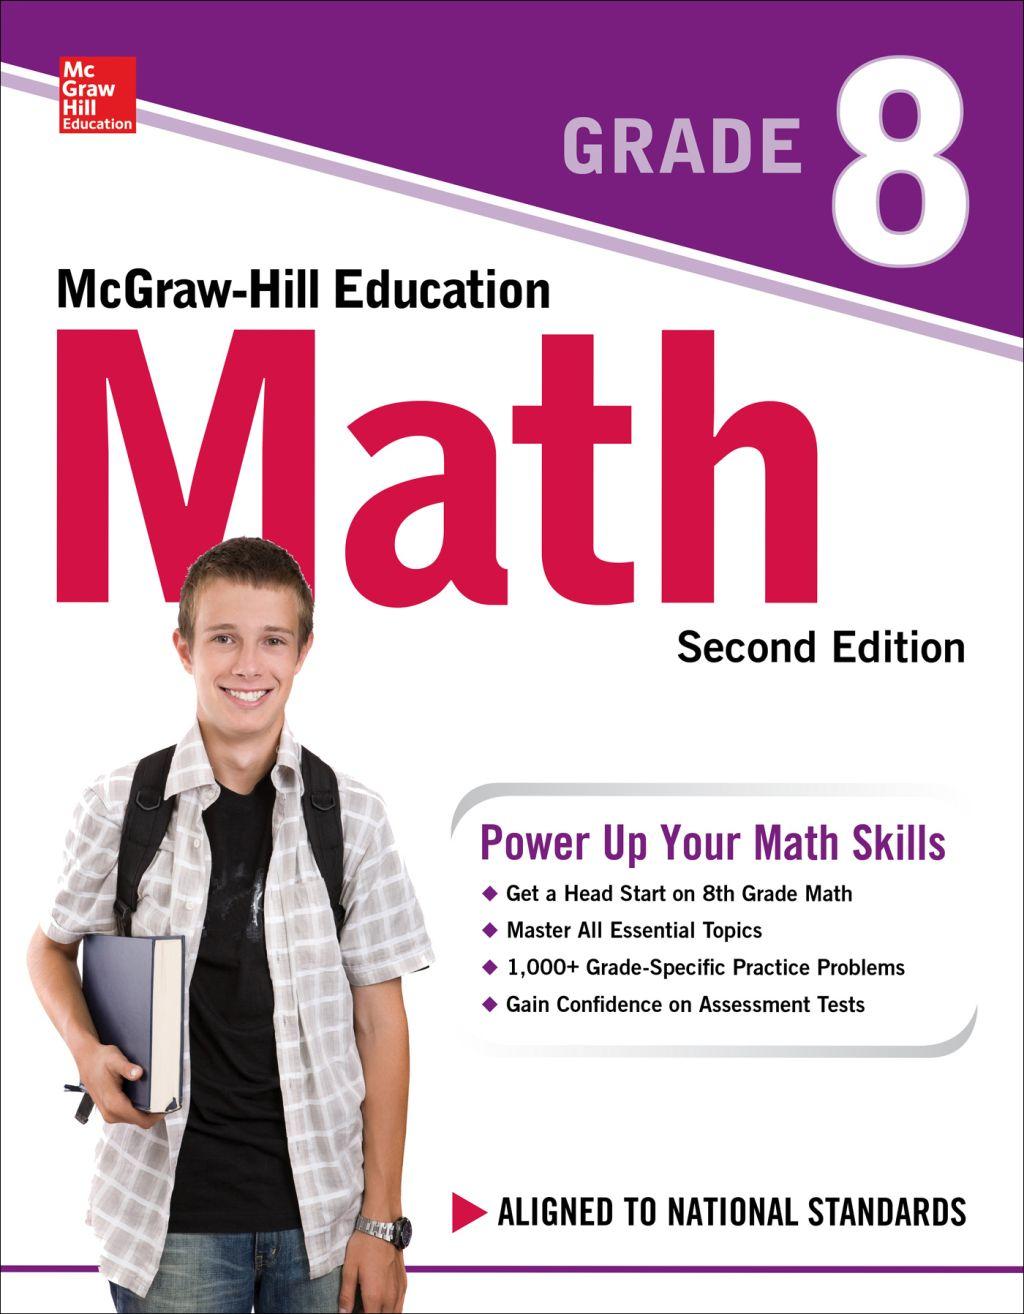 Mcgraw Hill Education Math Grade 8 Second Edition Ebook